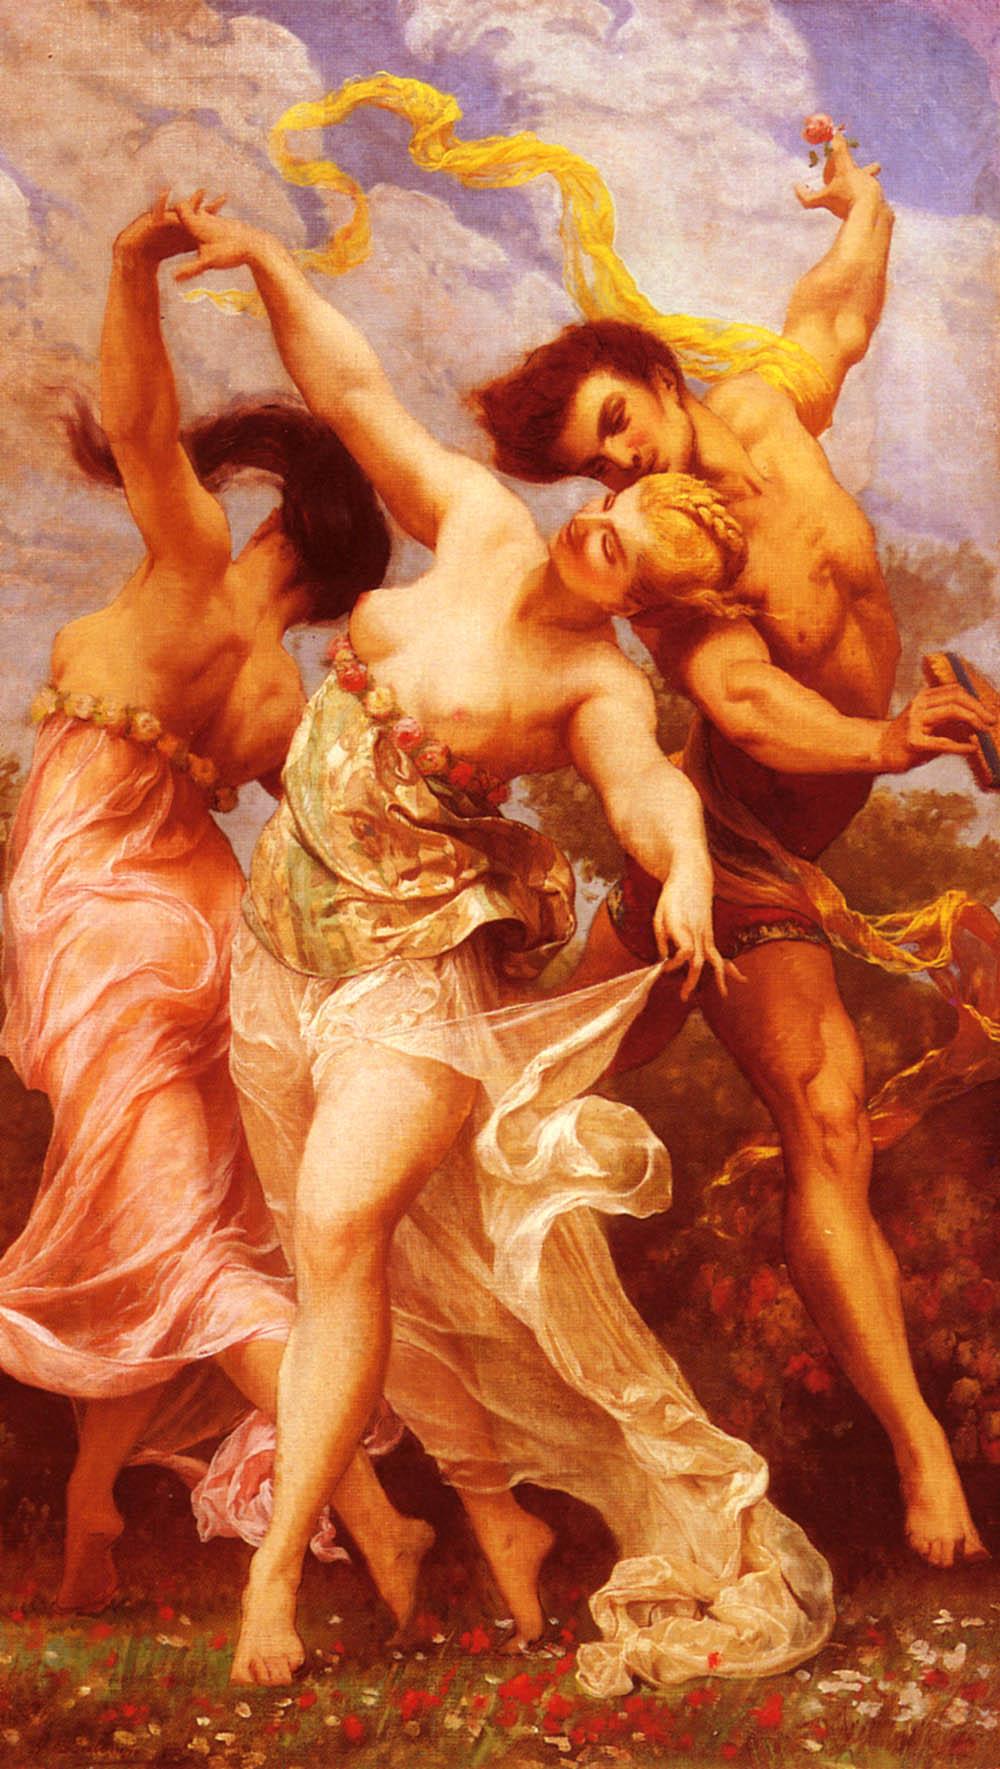 La Danse Amoureuse | Gustave Boulanger | Oil Painting